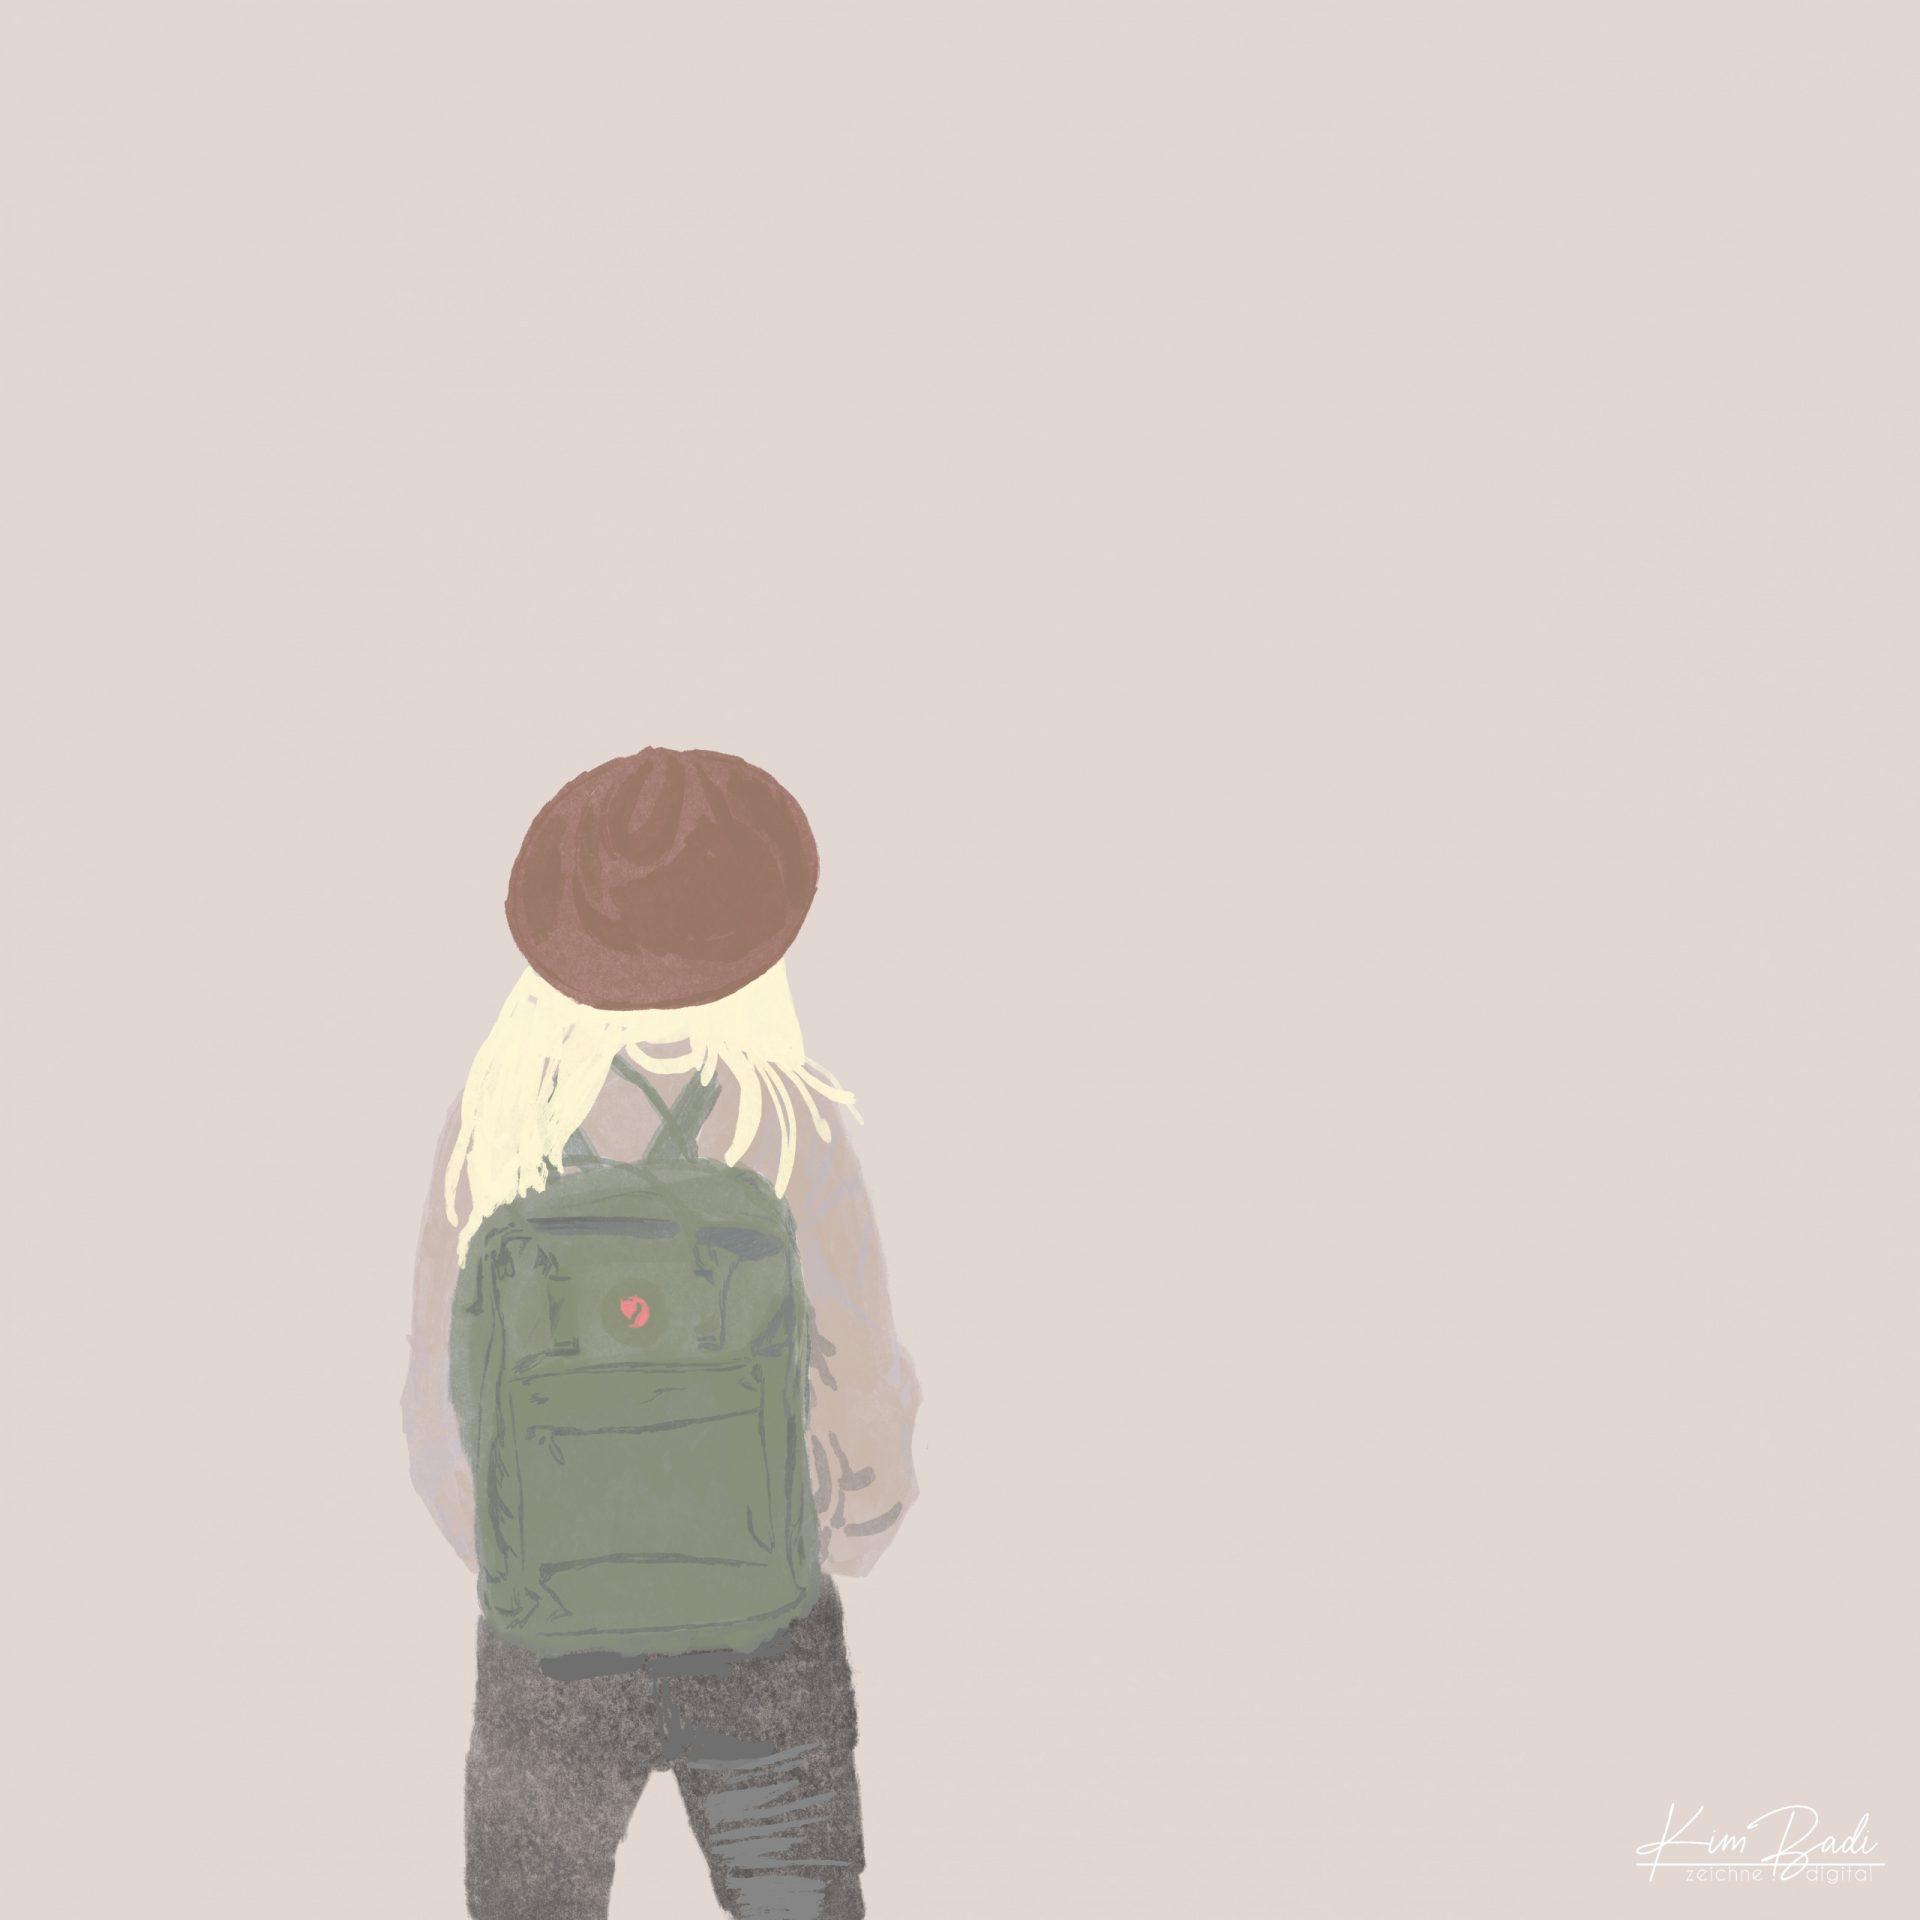 Kim Badi - digitale Kunst - Wanderlust Frau auf der Webseite www.kimbadi.com